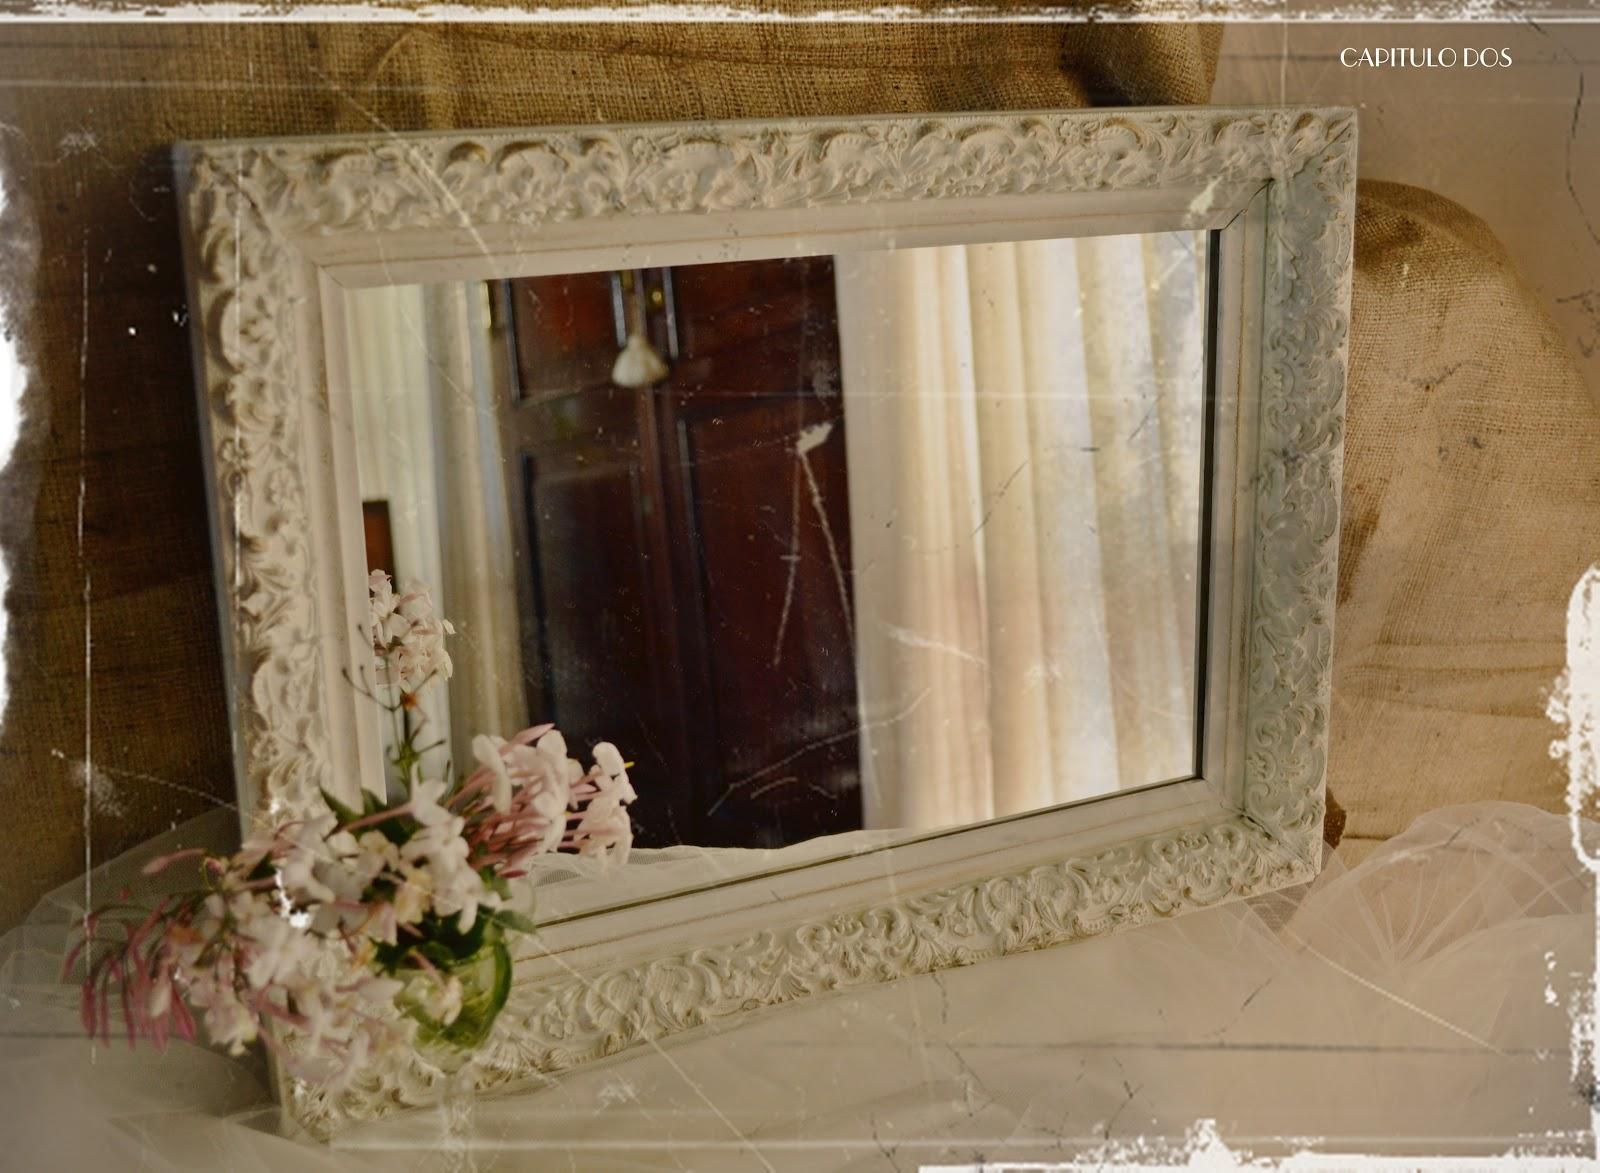 Capitulo dos espejito espejito ii for Pintar marco espejo